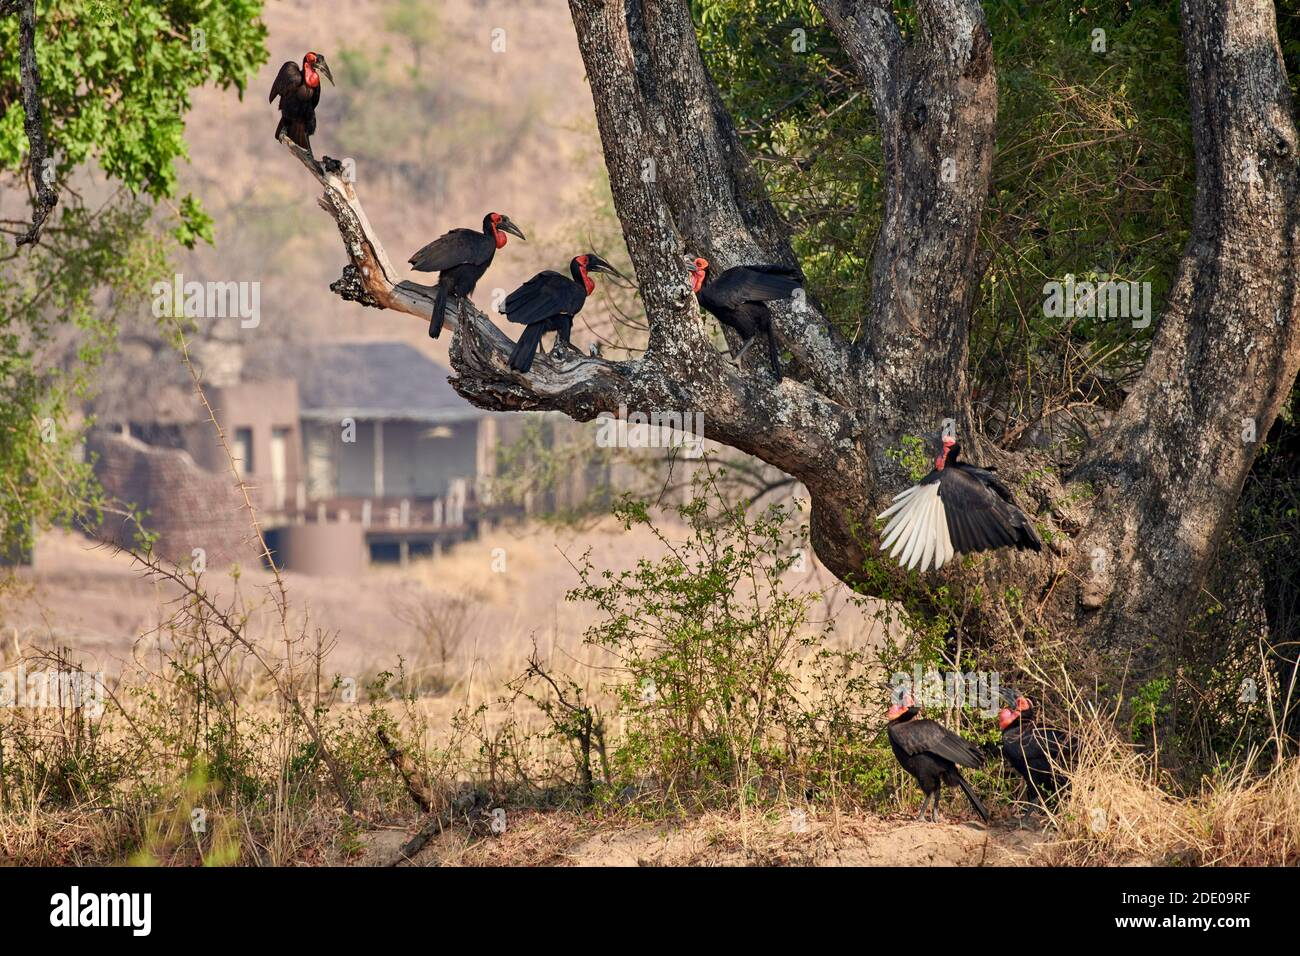 Siete Hornbill sur (Bucorvus leadbeateri; antes conocido como Bucorvus cafer), South Luangwa National Park, Mfuwe, Zambia, África Foto de stock